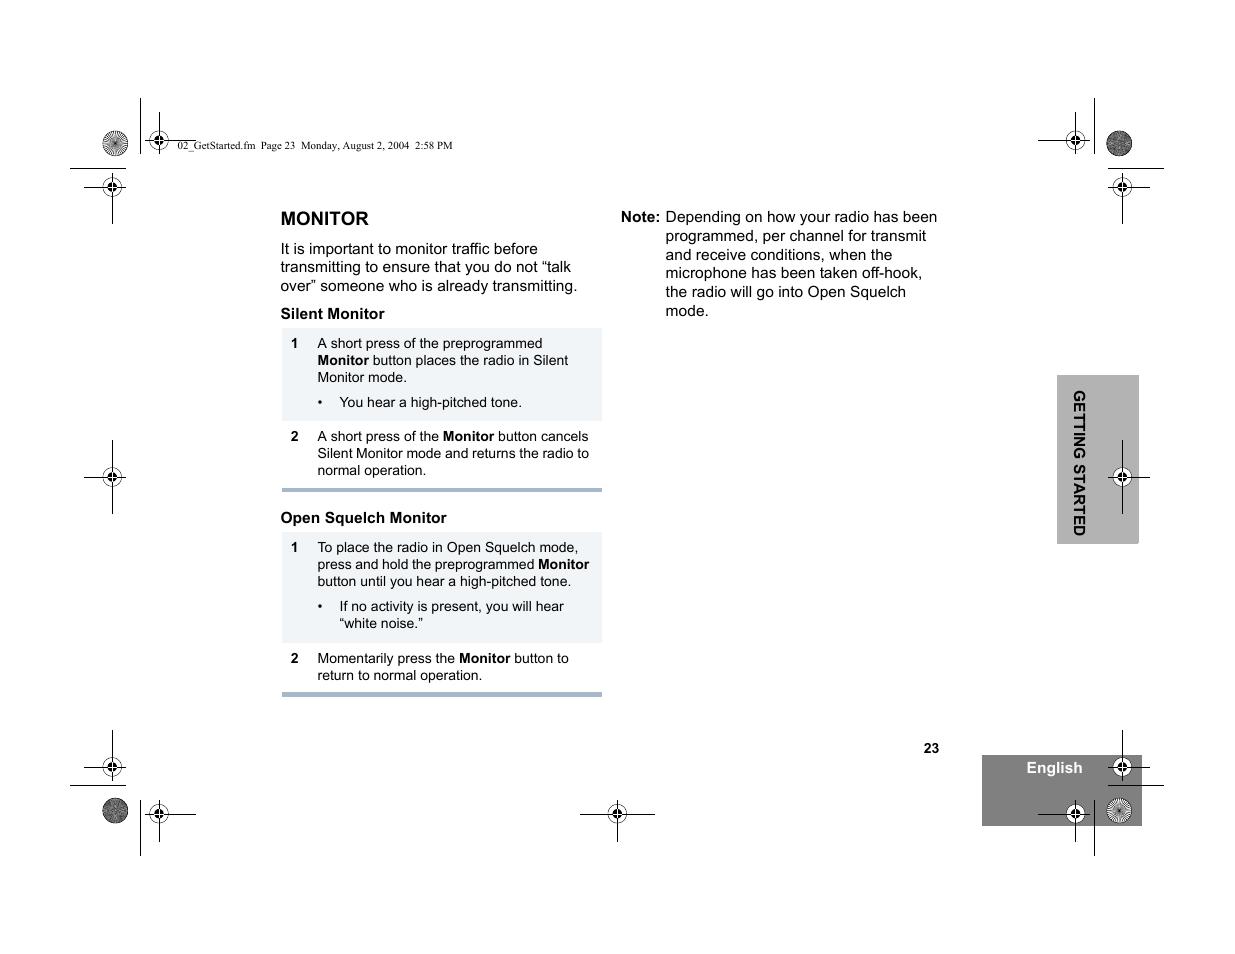 Motorola Pm400 Manual Cdm1250 Wiring Diagram Repeater Access User Page 33 76 Array Monitor Silent Open Squelch Rh Manualsdir Com